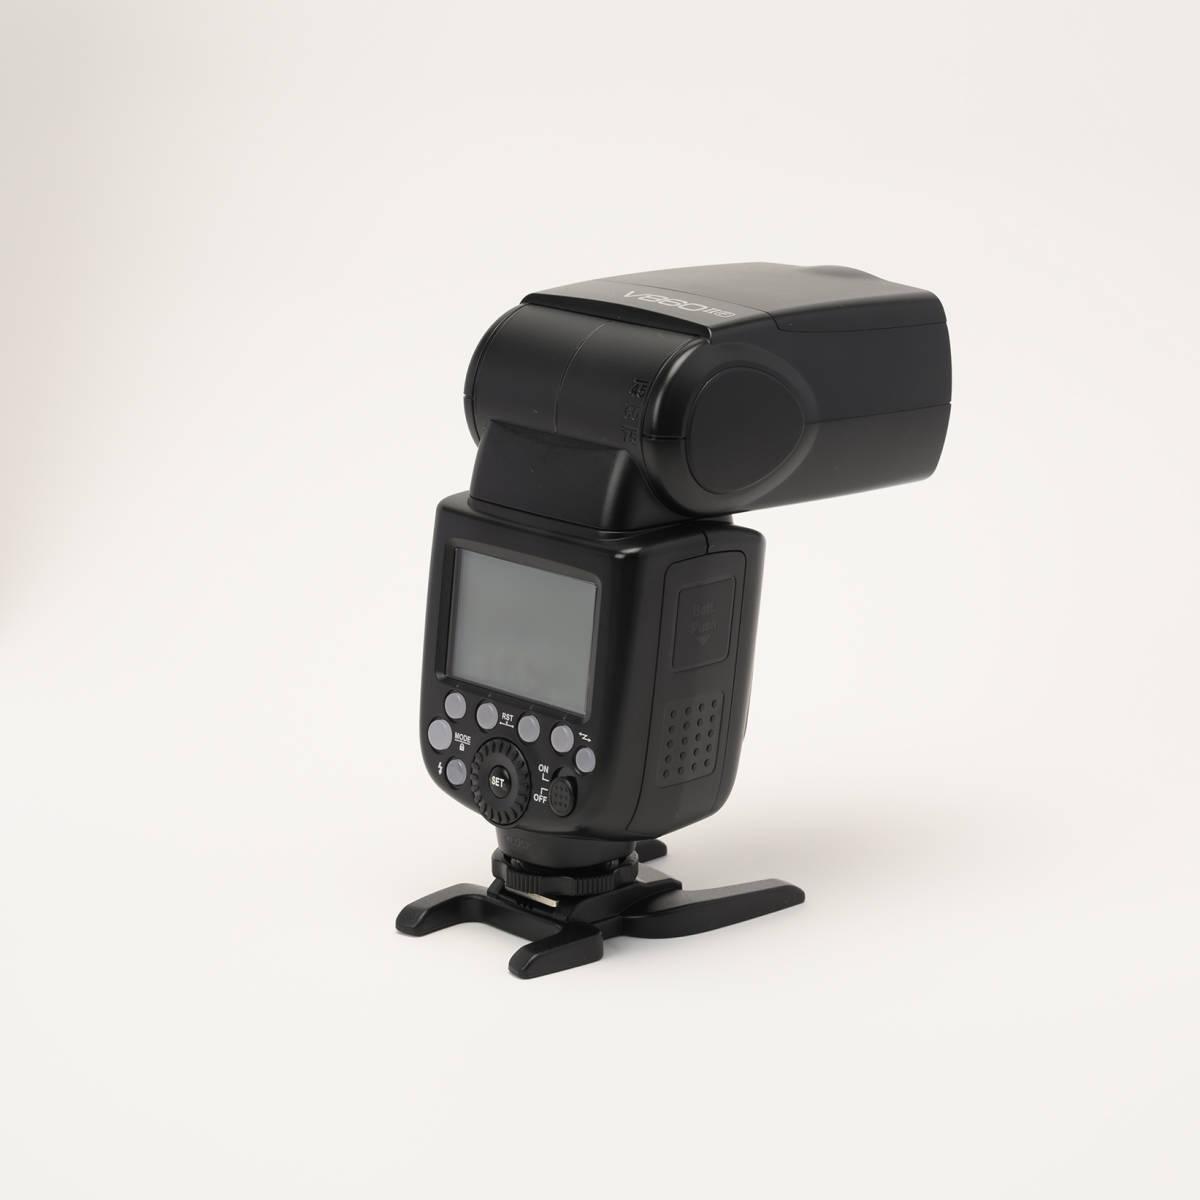 Godox V860IIF 富士カメラ用 カメラフラッシュ 2.4GHz ワイヤレスX1システム TTL GN60 充電式電池_画像5